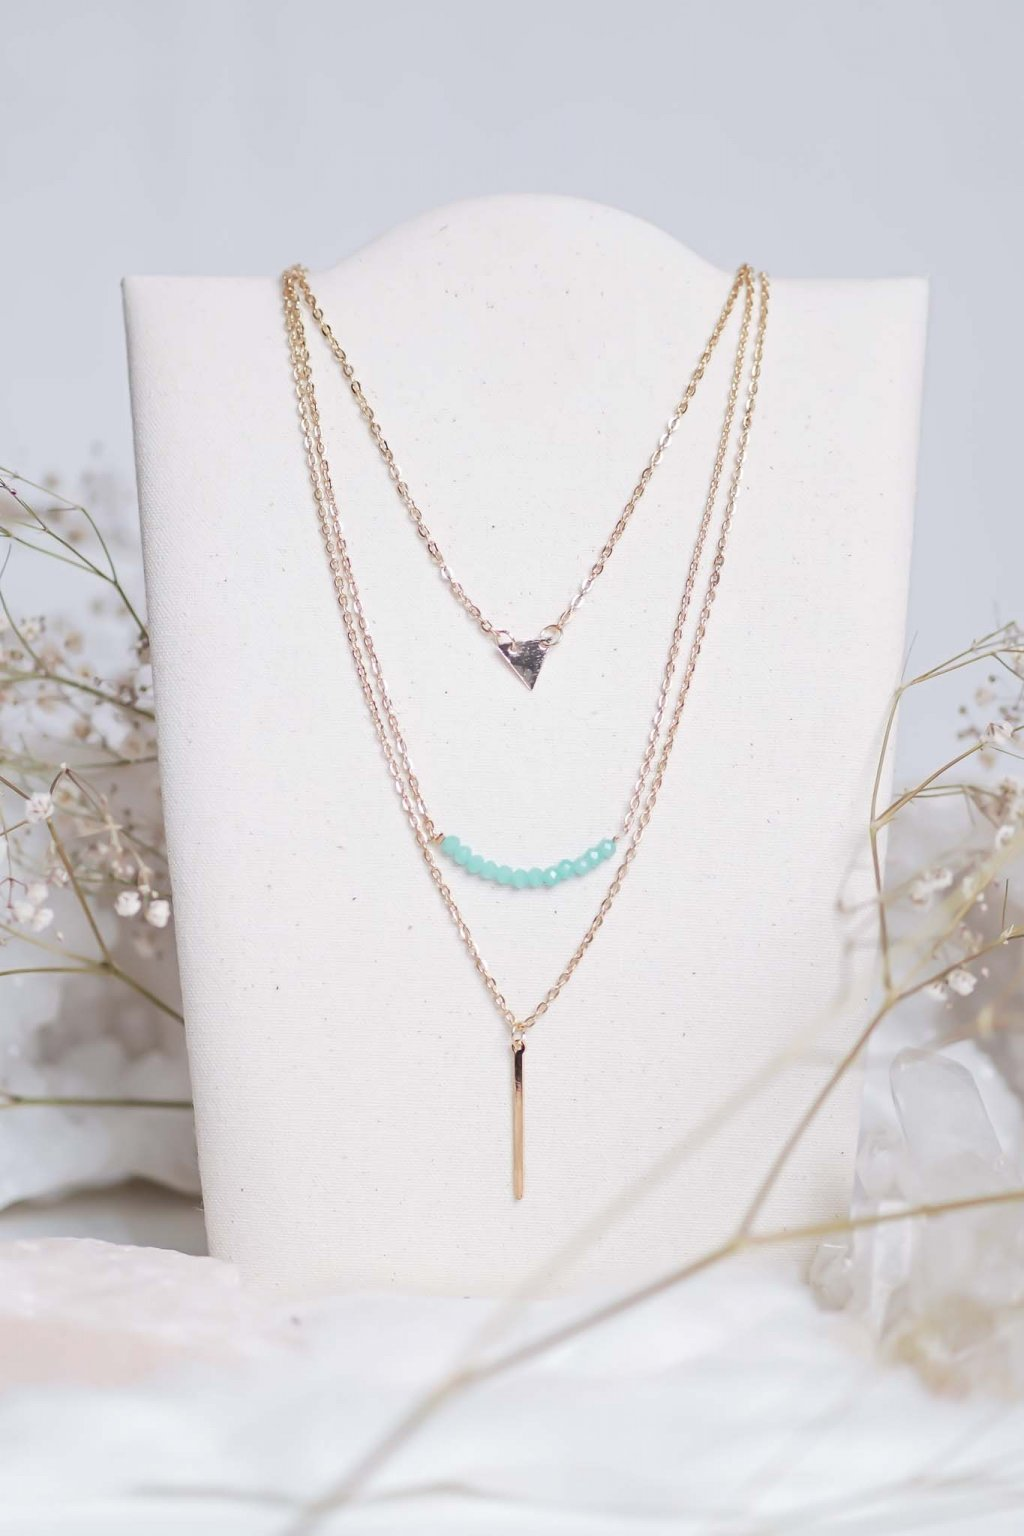 náhrdelník, šperk, spoločenská náhrdelník, náhrdelník na bežný deň, výrazný náhrdelník, jemný náhrdelník, šperky, náhrdelník na ples, svadbu, stužkovú 18